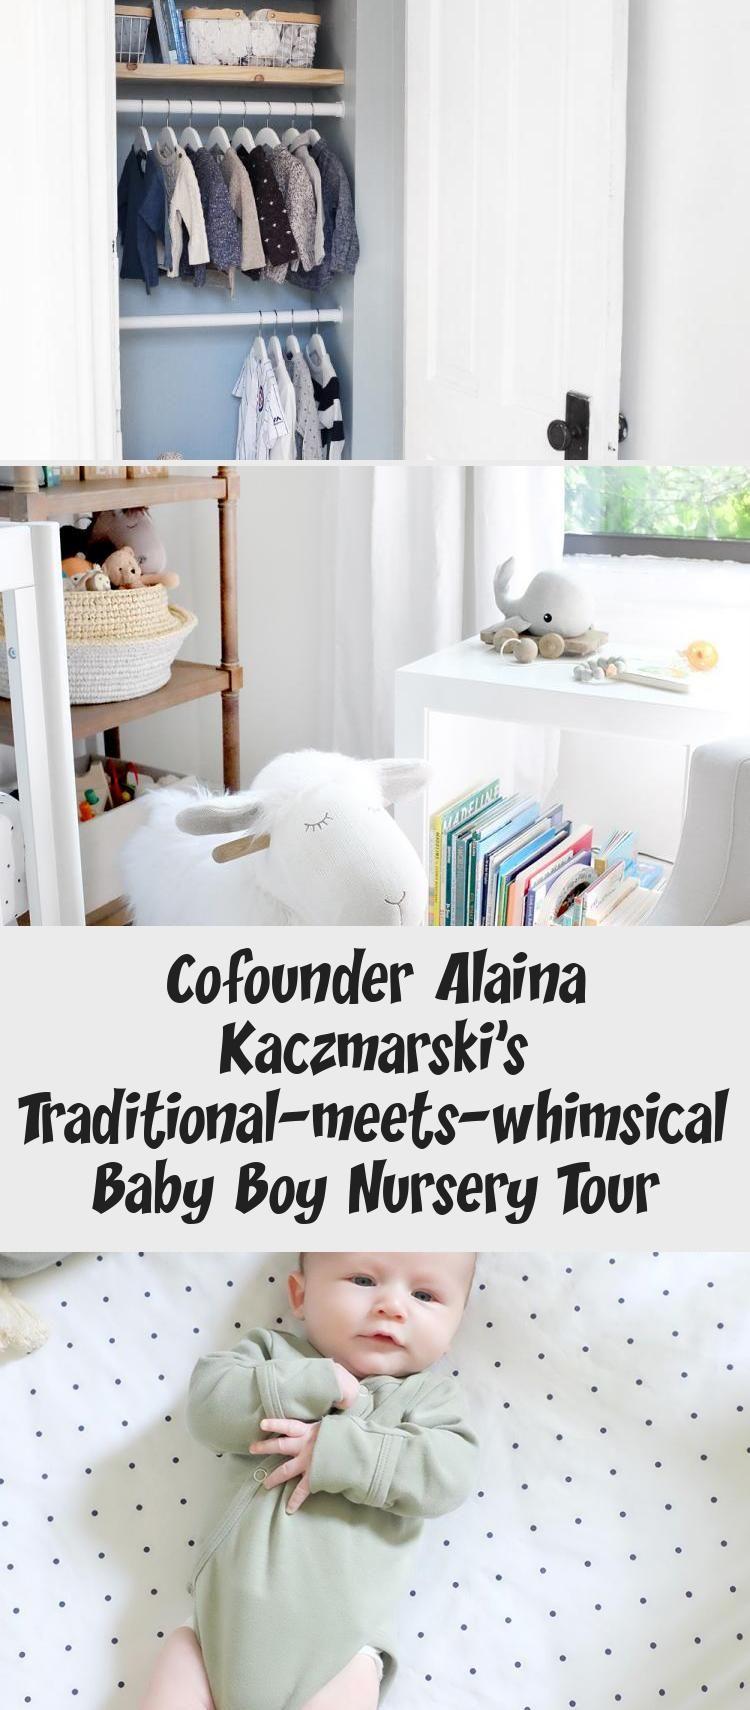 Photo of Cofounder Alaina Kaczmarski's Traditional-meets-whimsical Baby Boy Nursery Tour